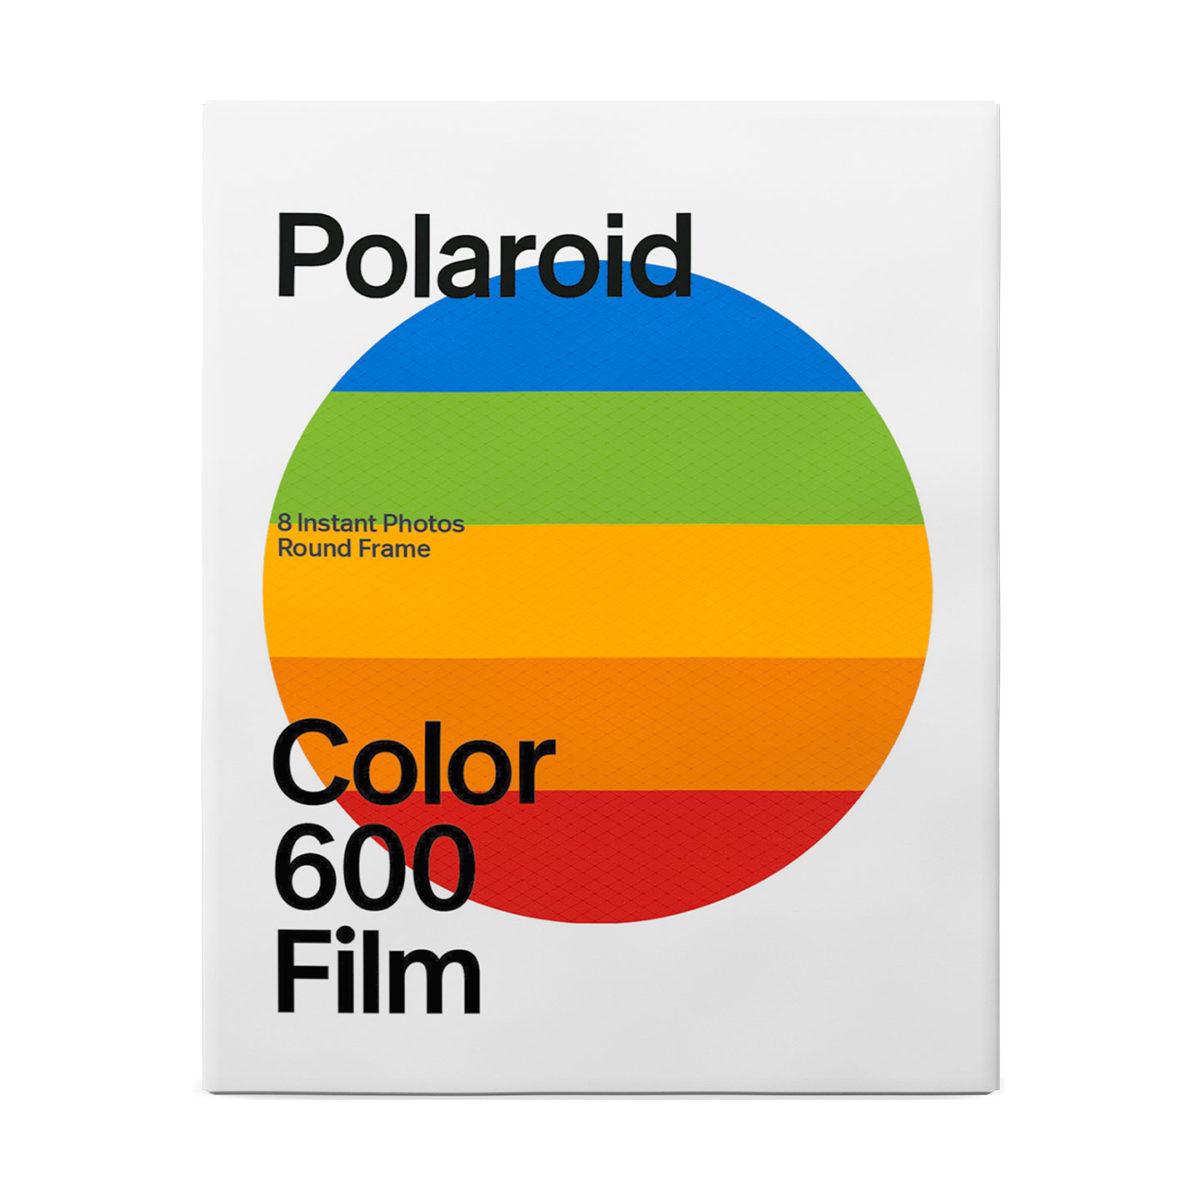 polaroid_600_color_film_round_frame_02